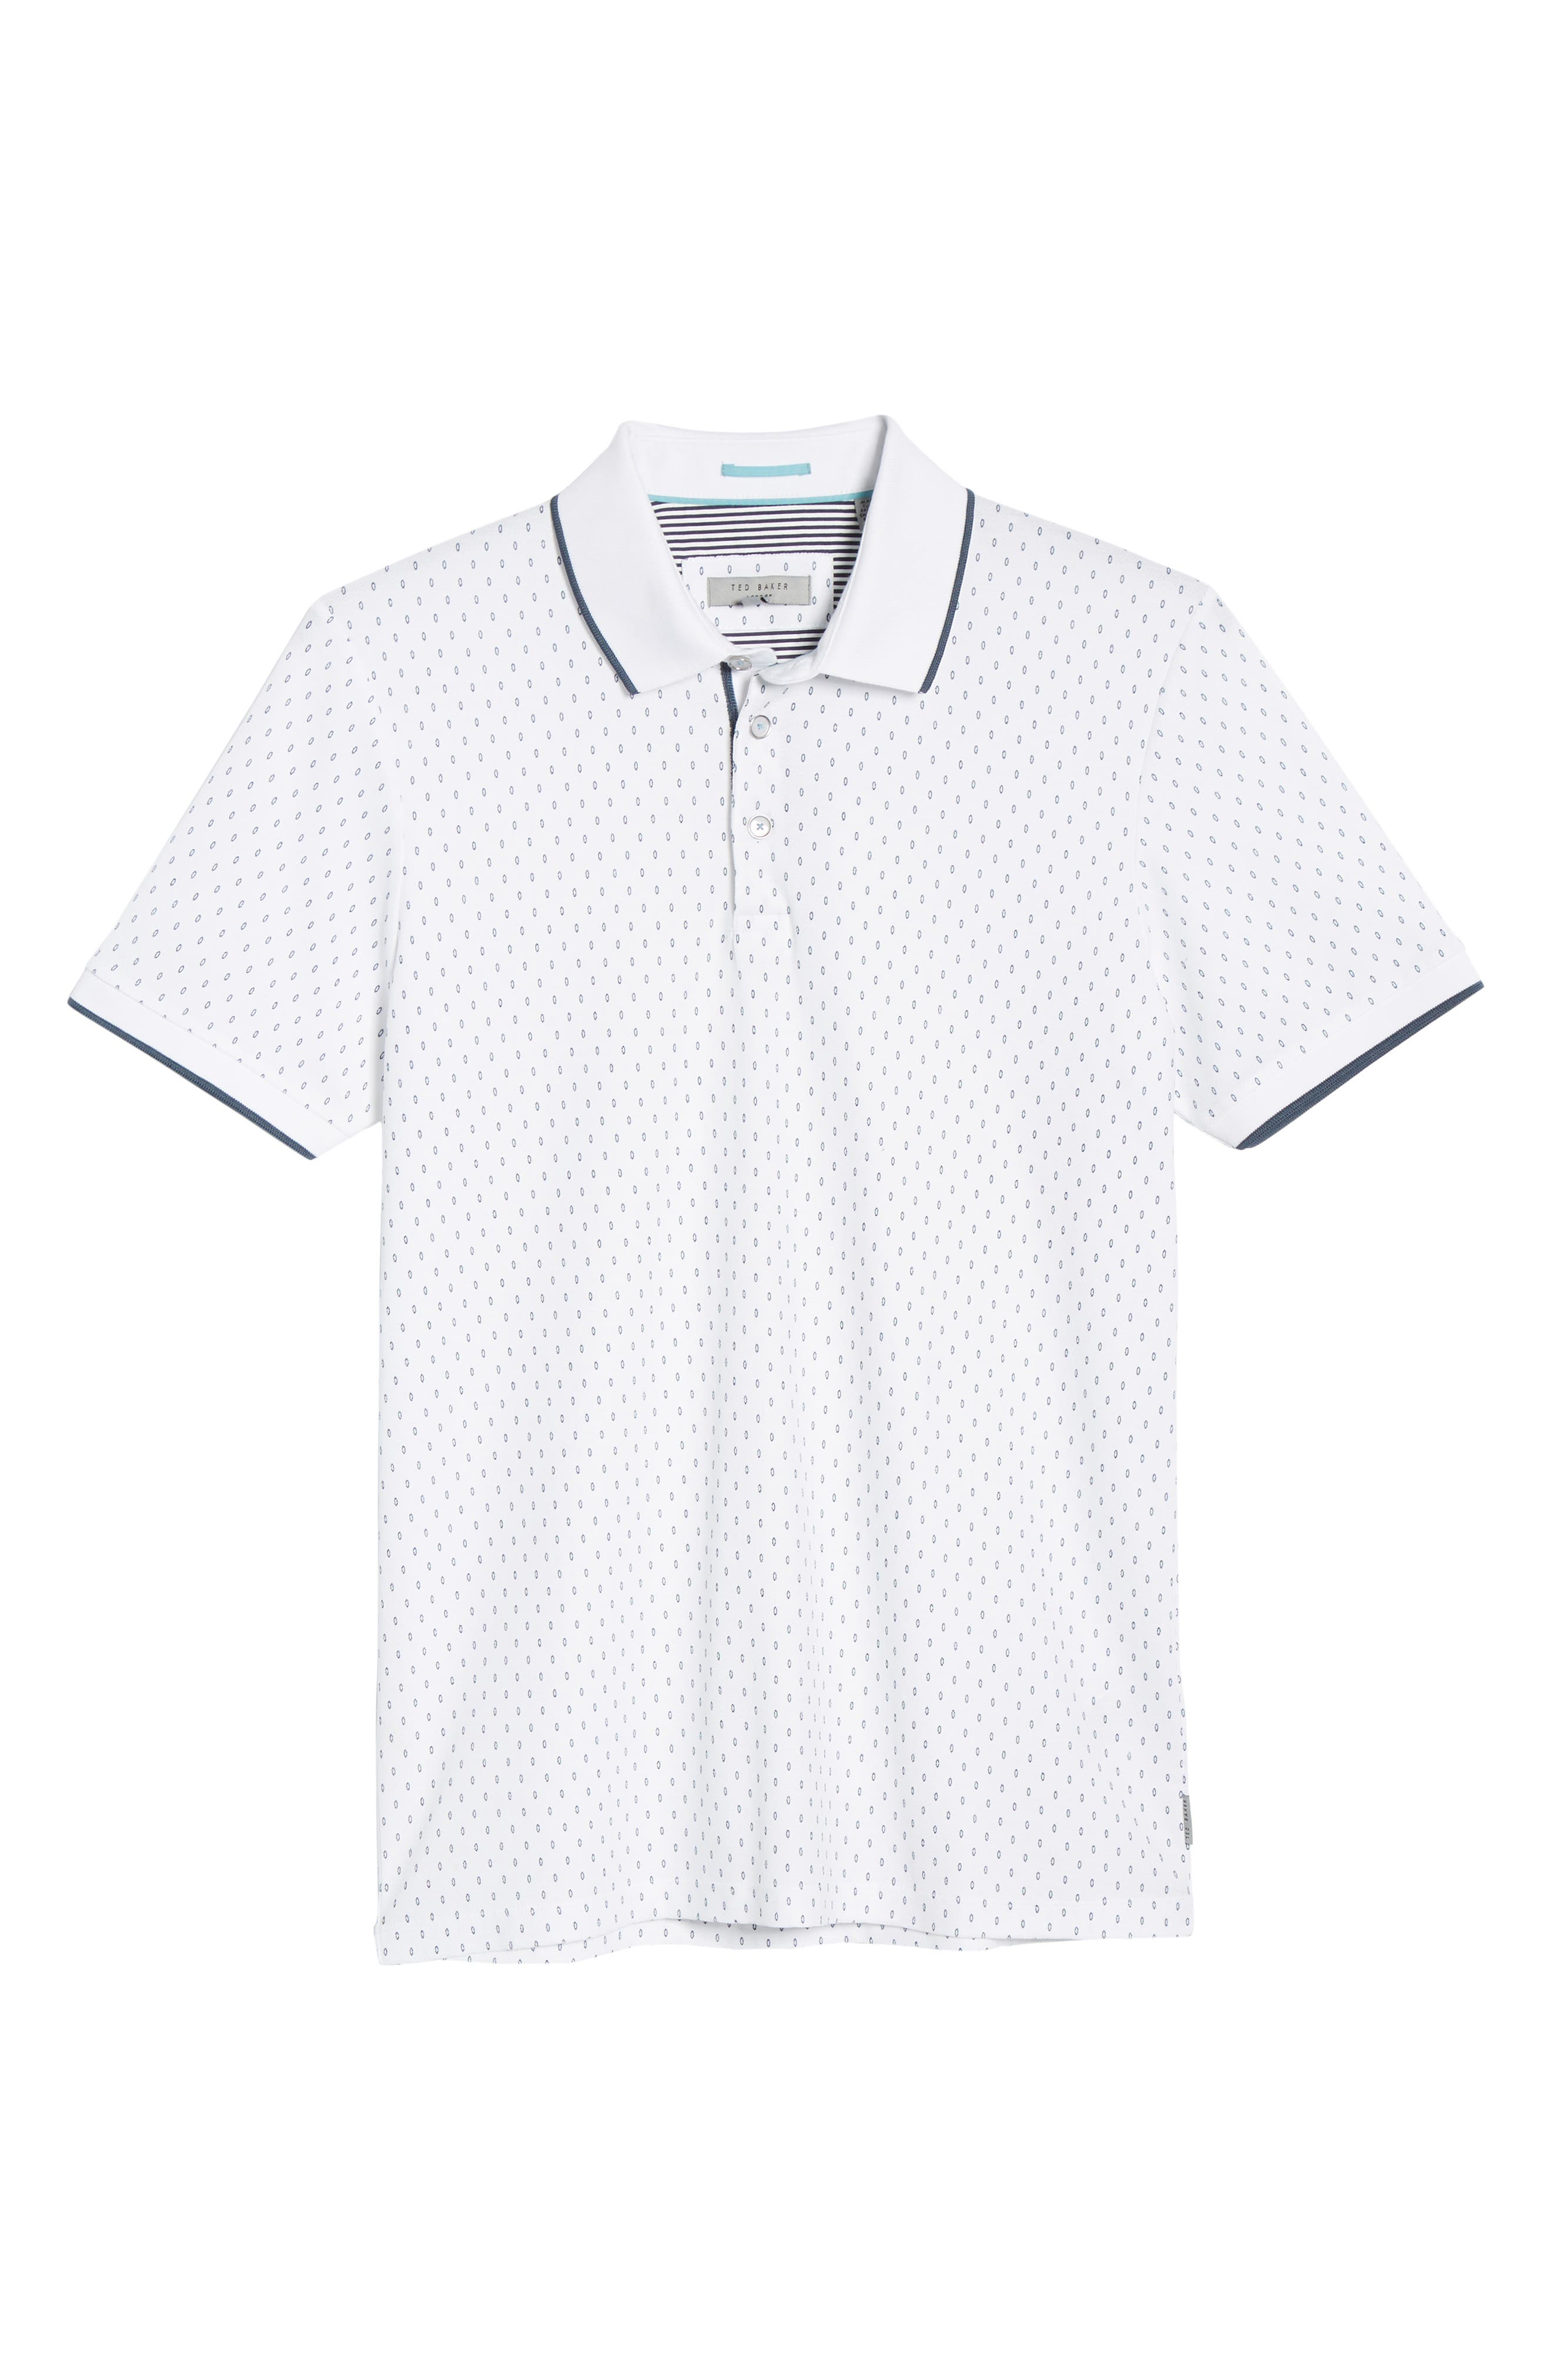 2e7617028fbb Men s Ted Baker London Polo Shirts